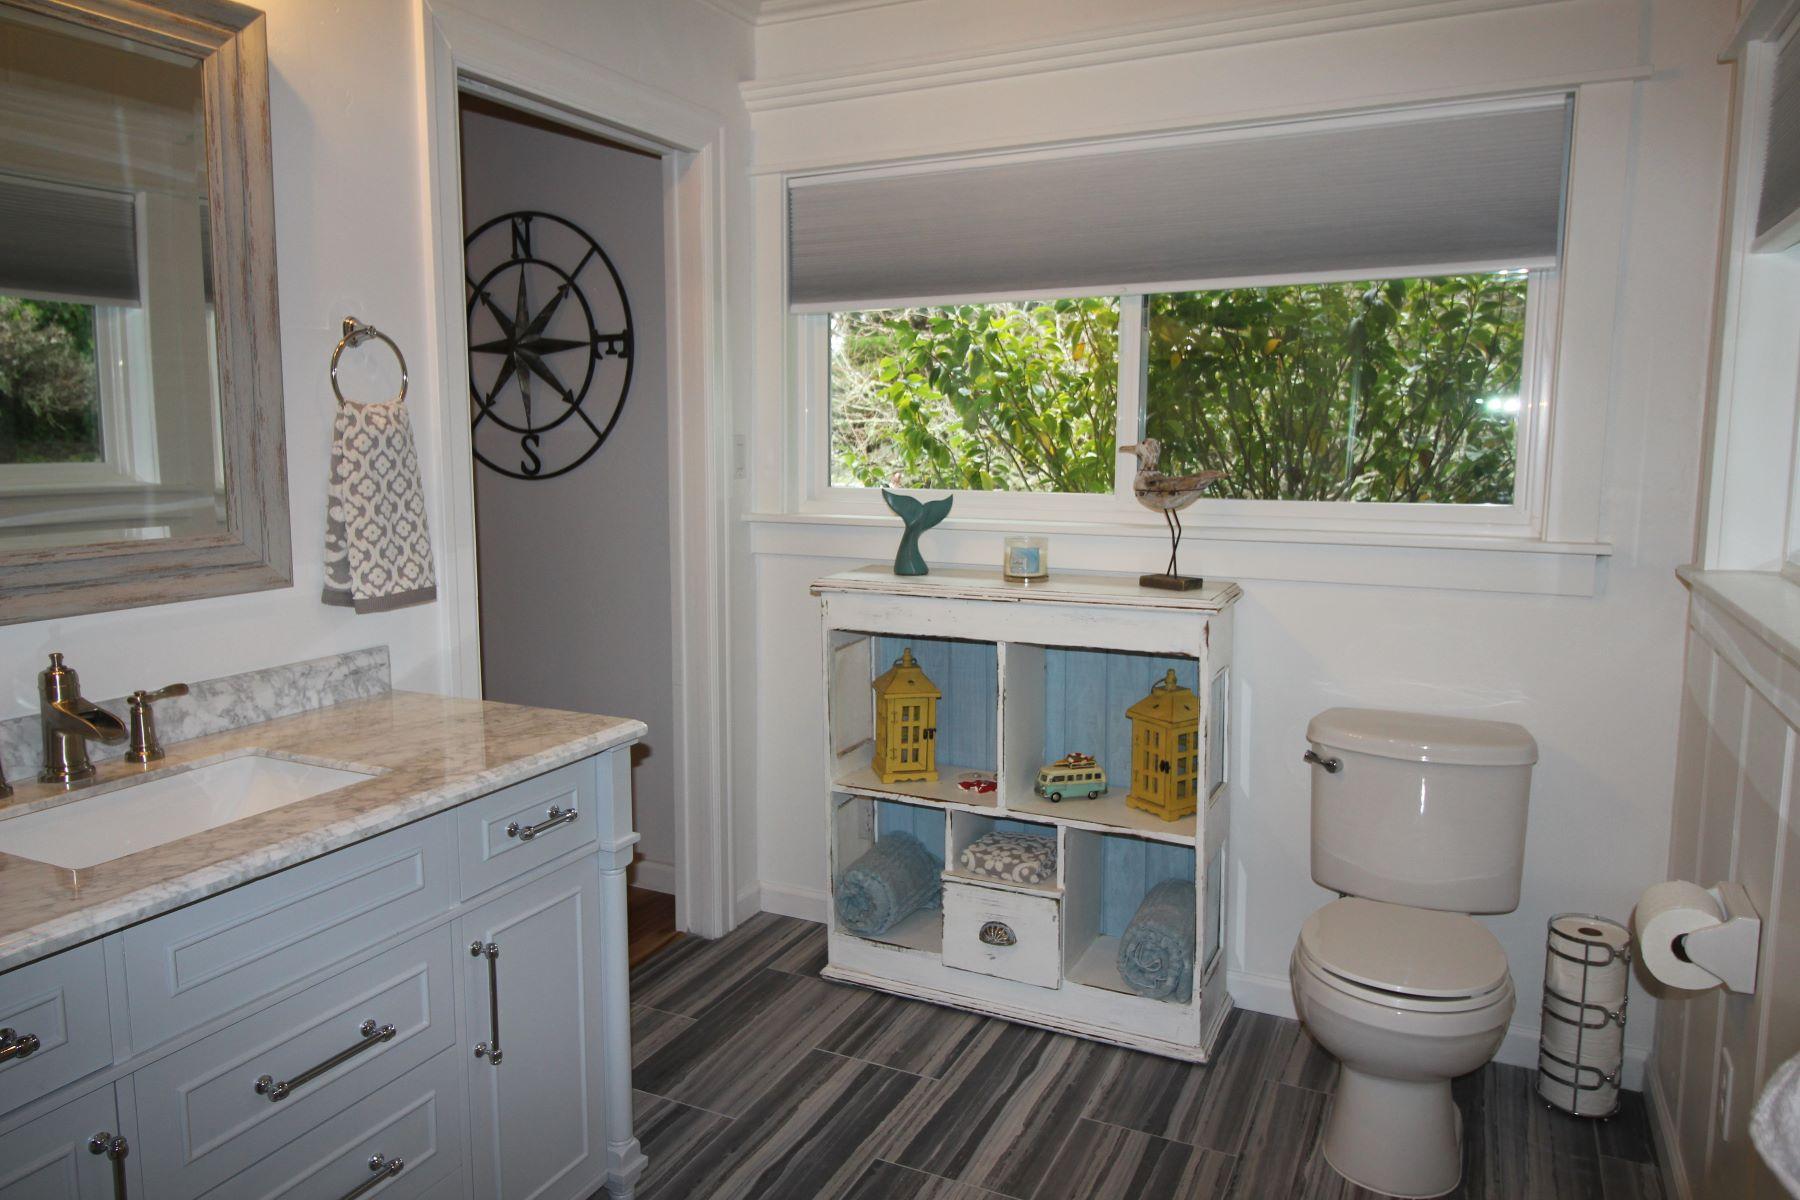 Additional photo for property listing at Coastal Charm! 44711 Pine Street Mendocino, California 95460 Estados Unidos